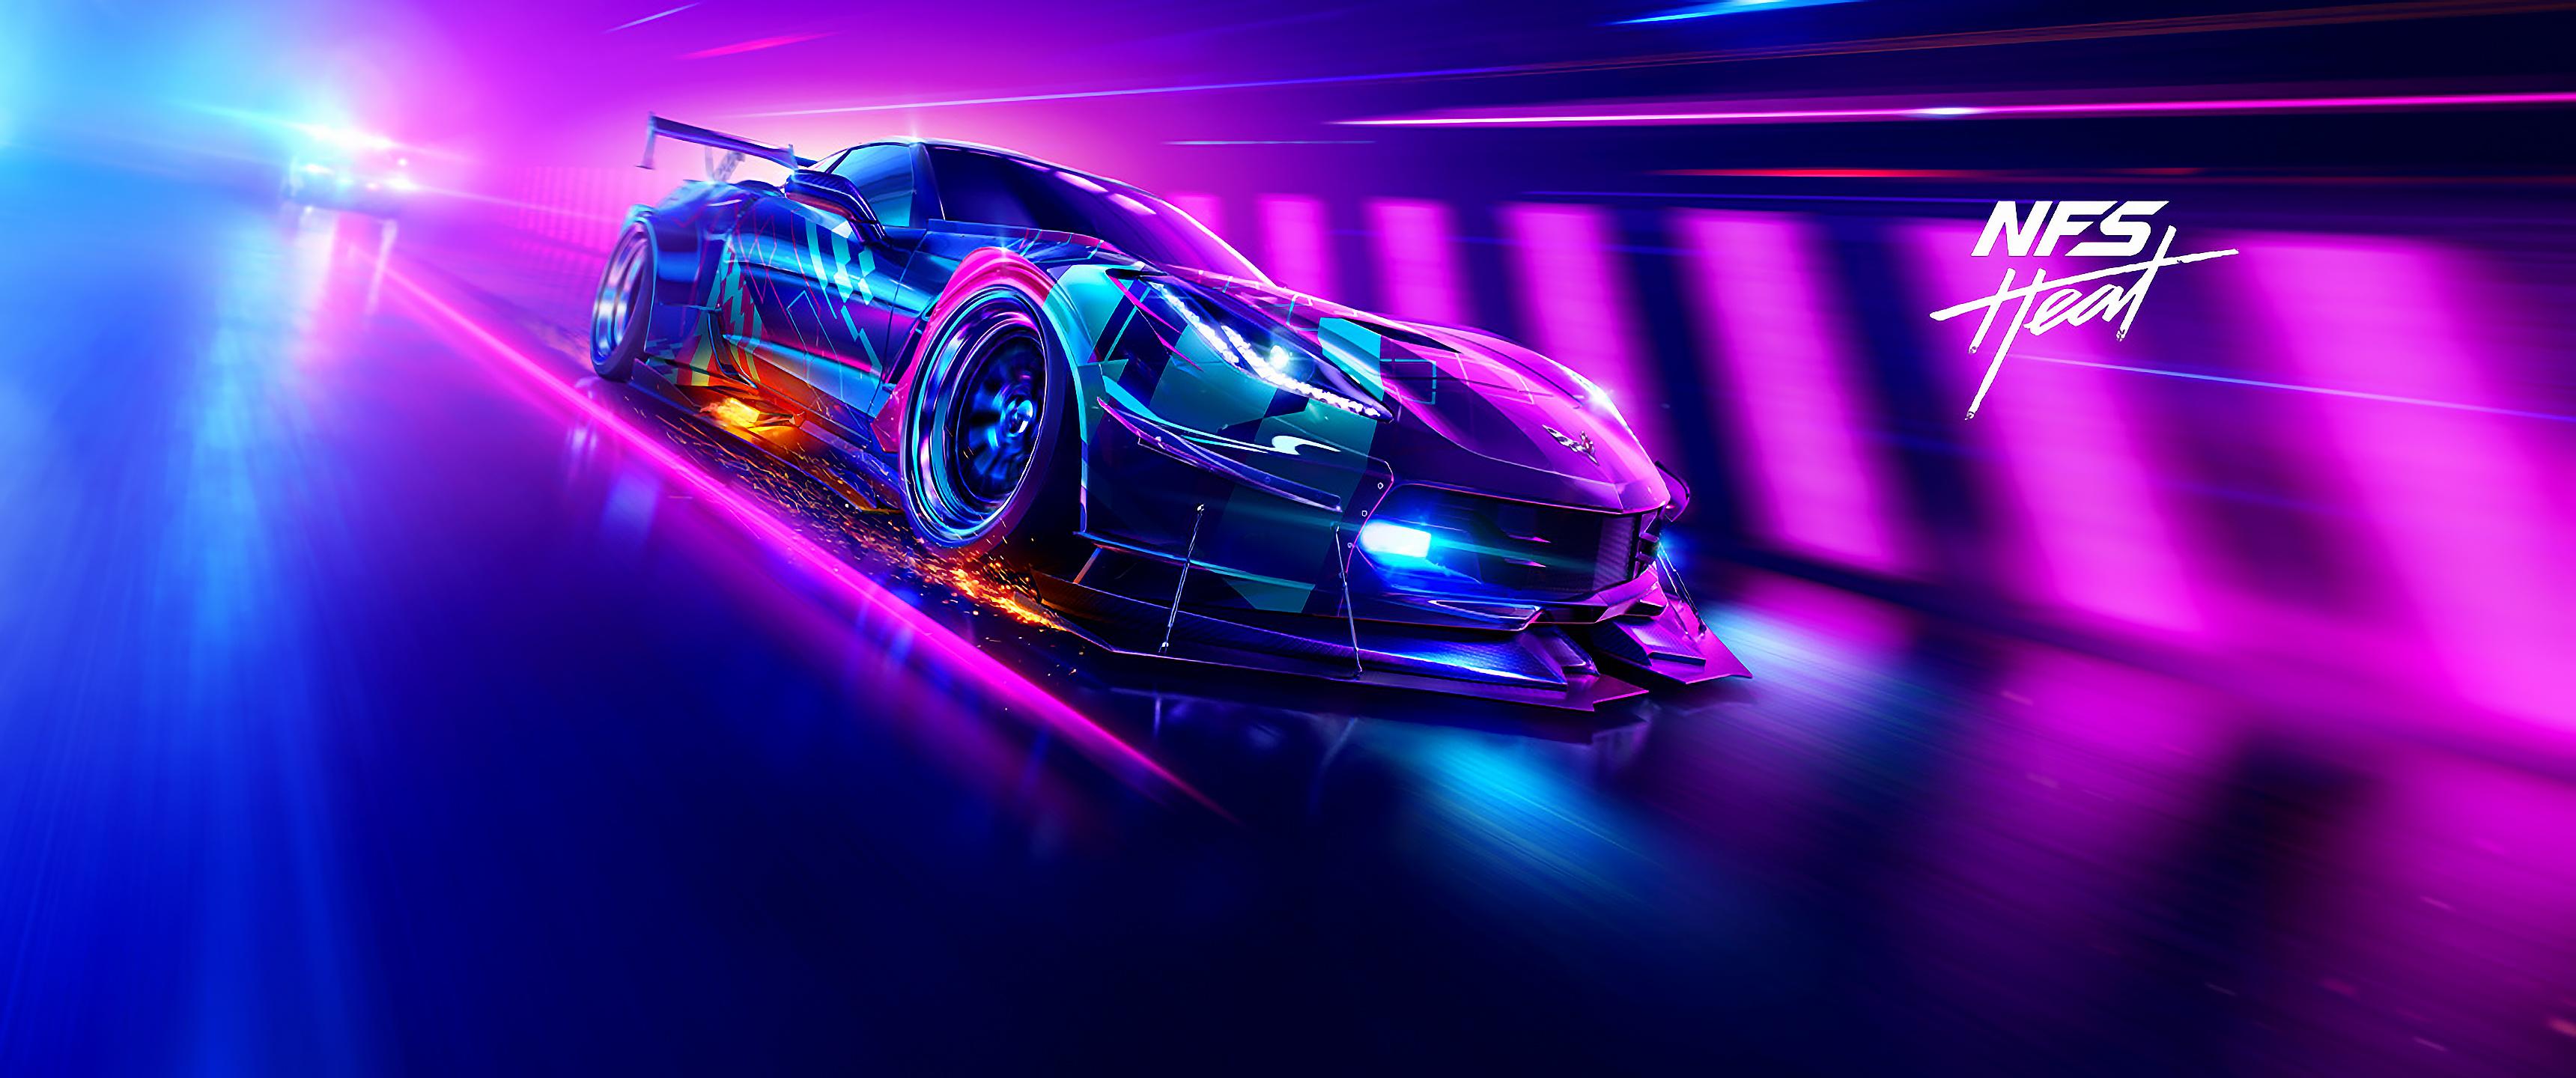 General 3440x1440 video games video game art ultrawide ultra-wide Need for Speed: Heat car Corvette Retrowave